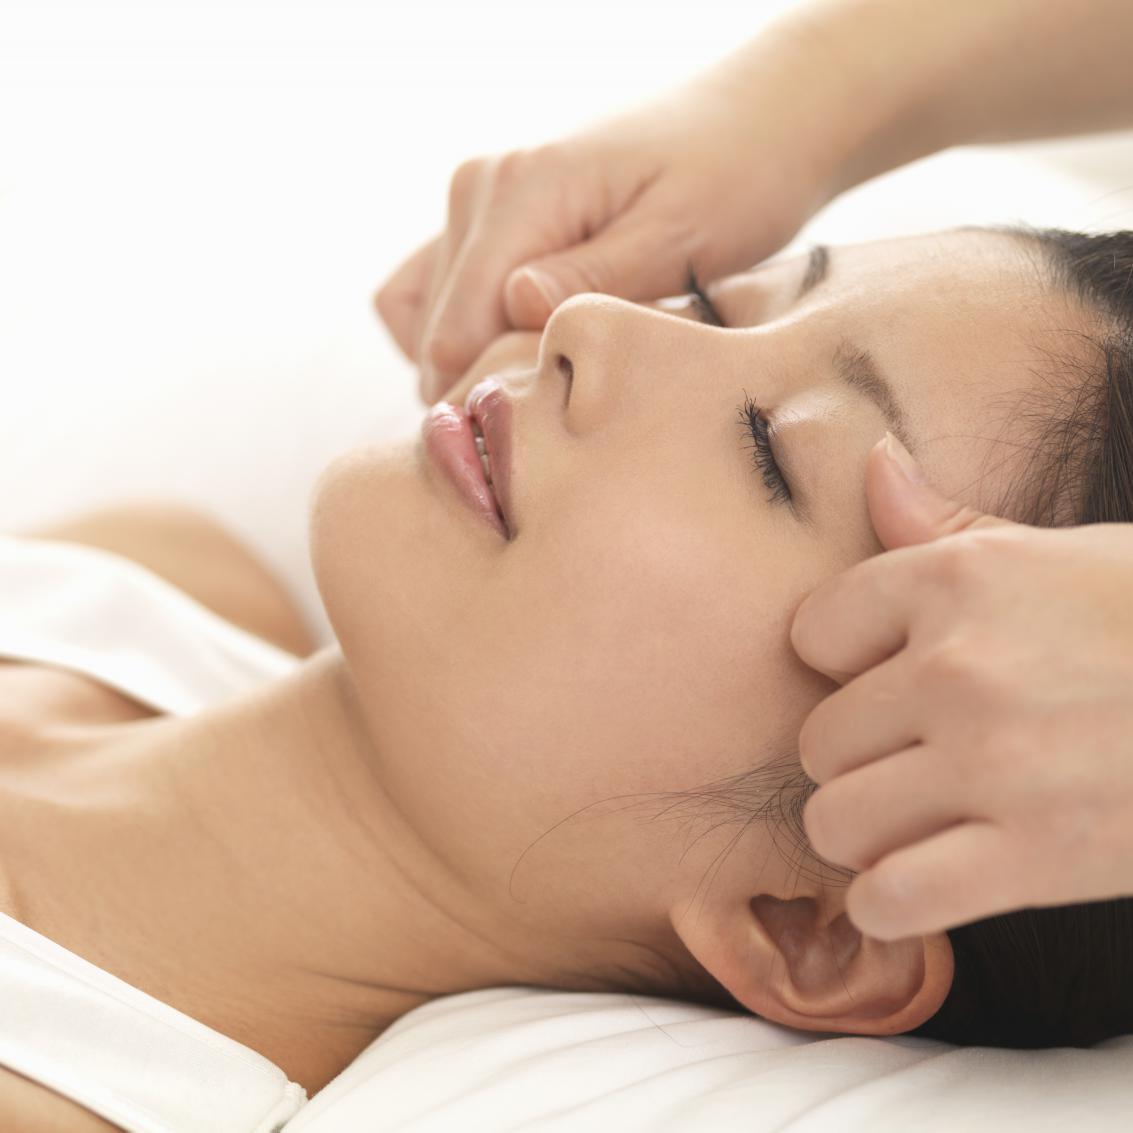 massage visage japonais aj22 jornalagora. Black Bedroom Furniture Sets. Home Design Ideas